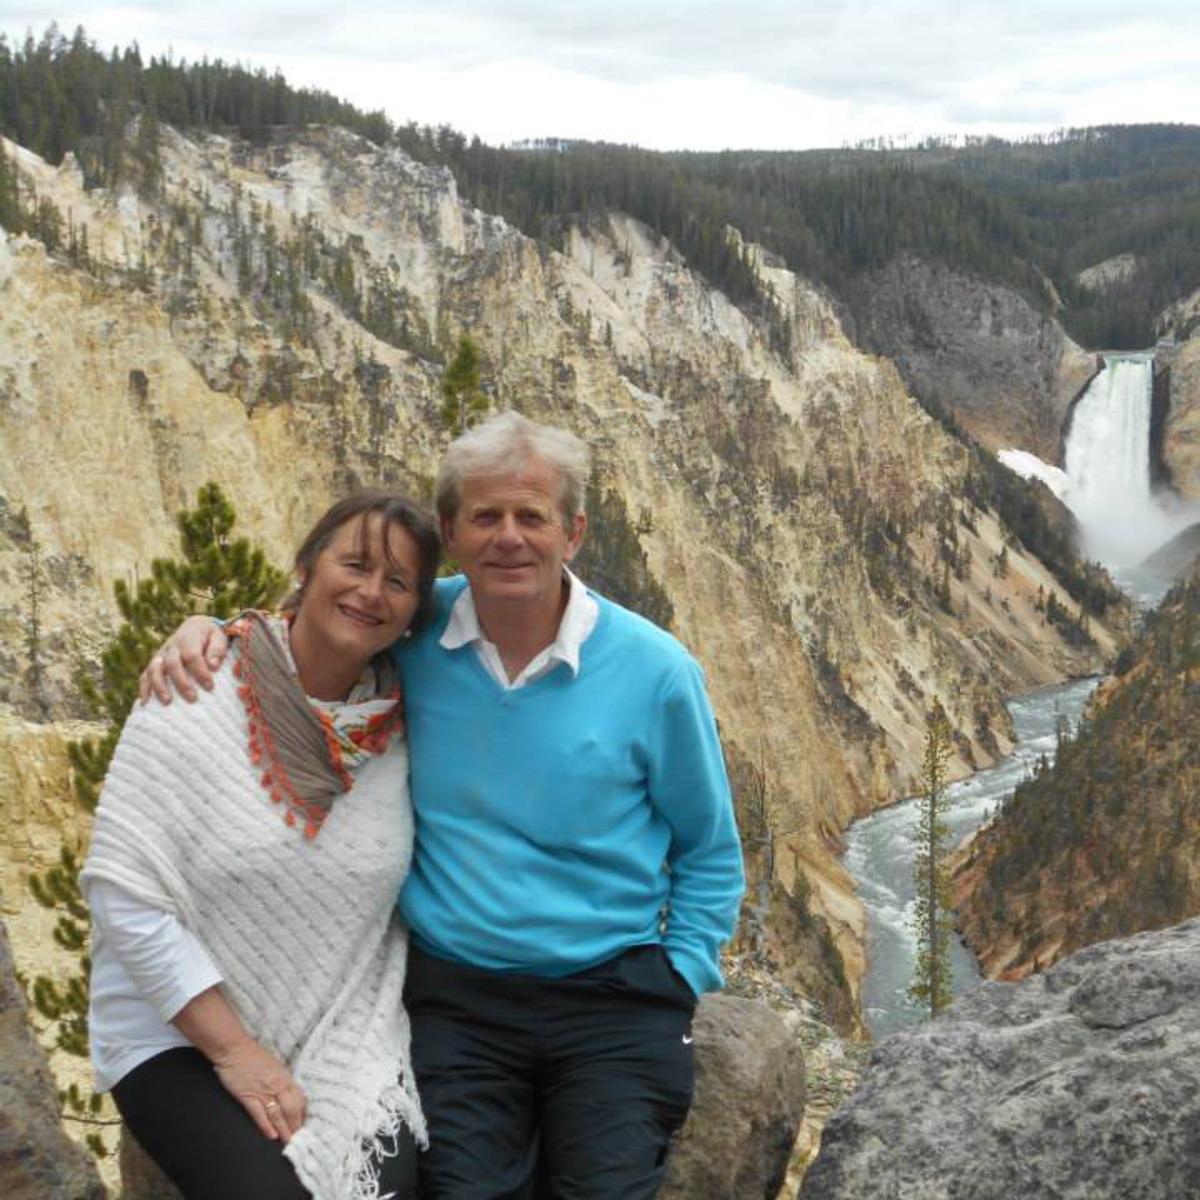 Anne og Wiggo Svendsen står foran en canyon